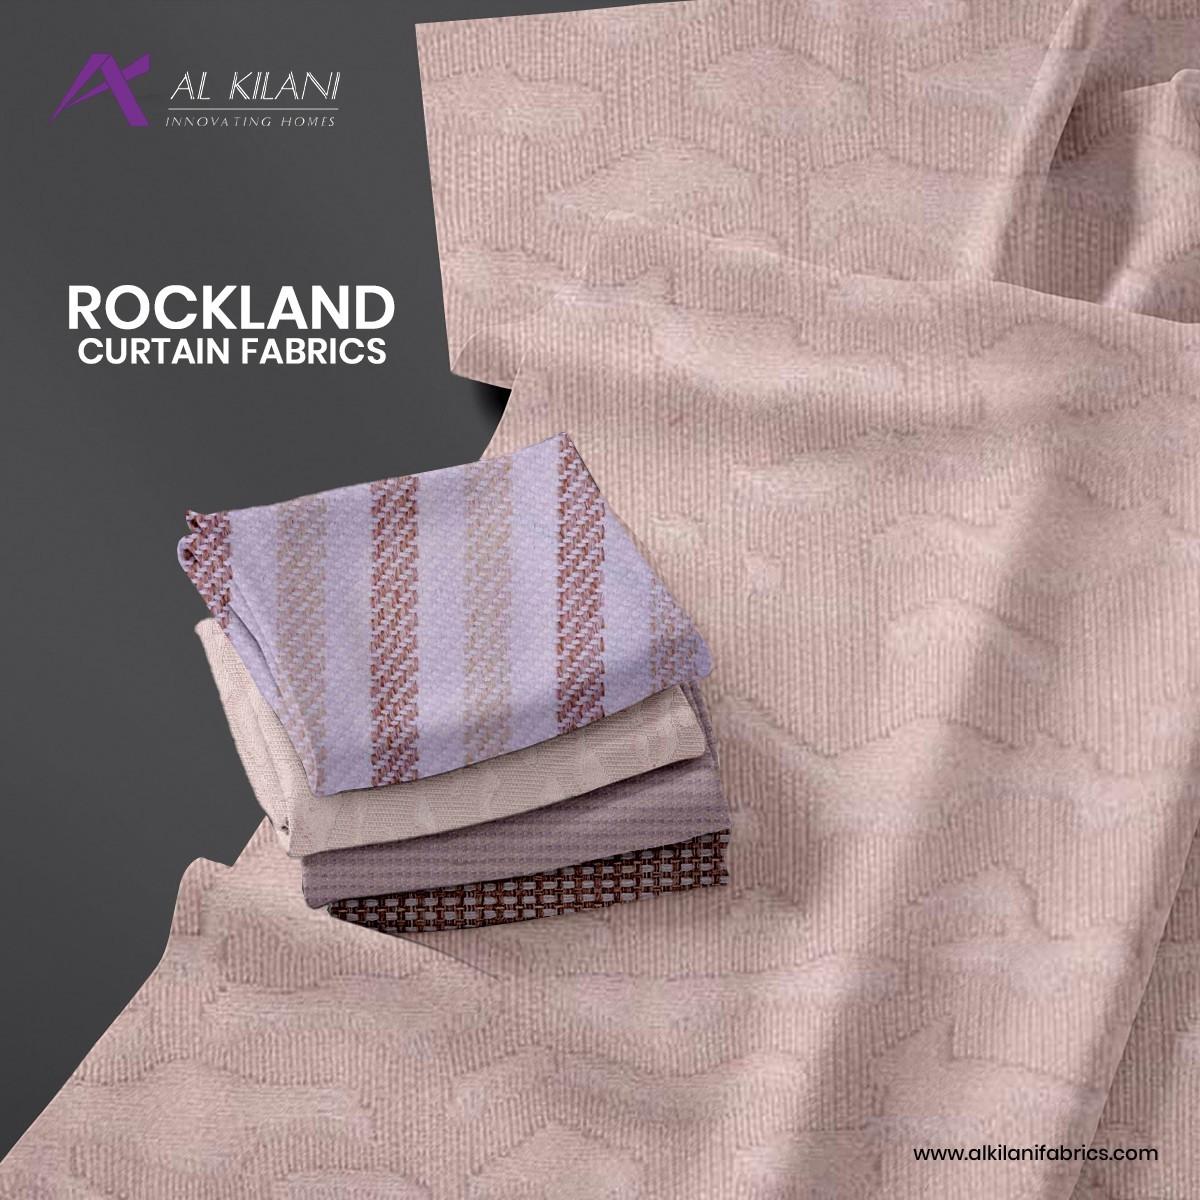 Rockland Curtain Fabrics